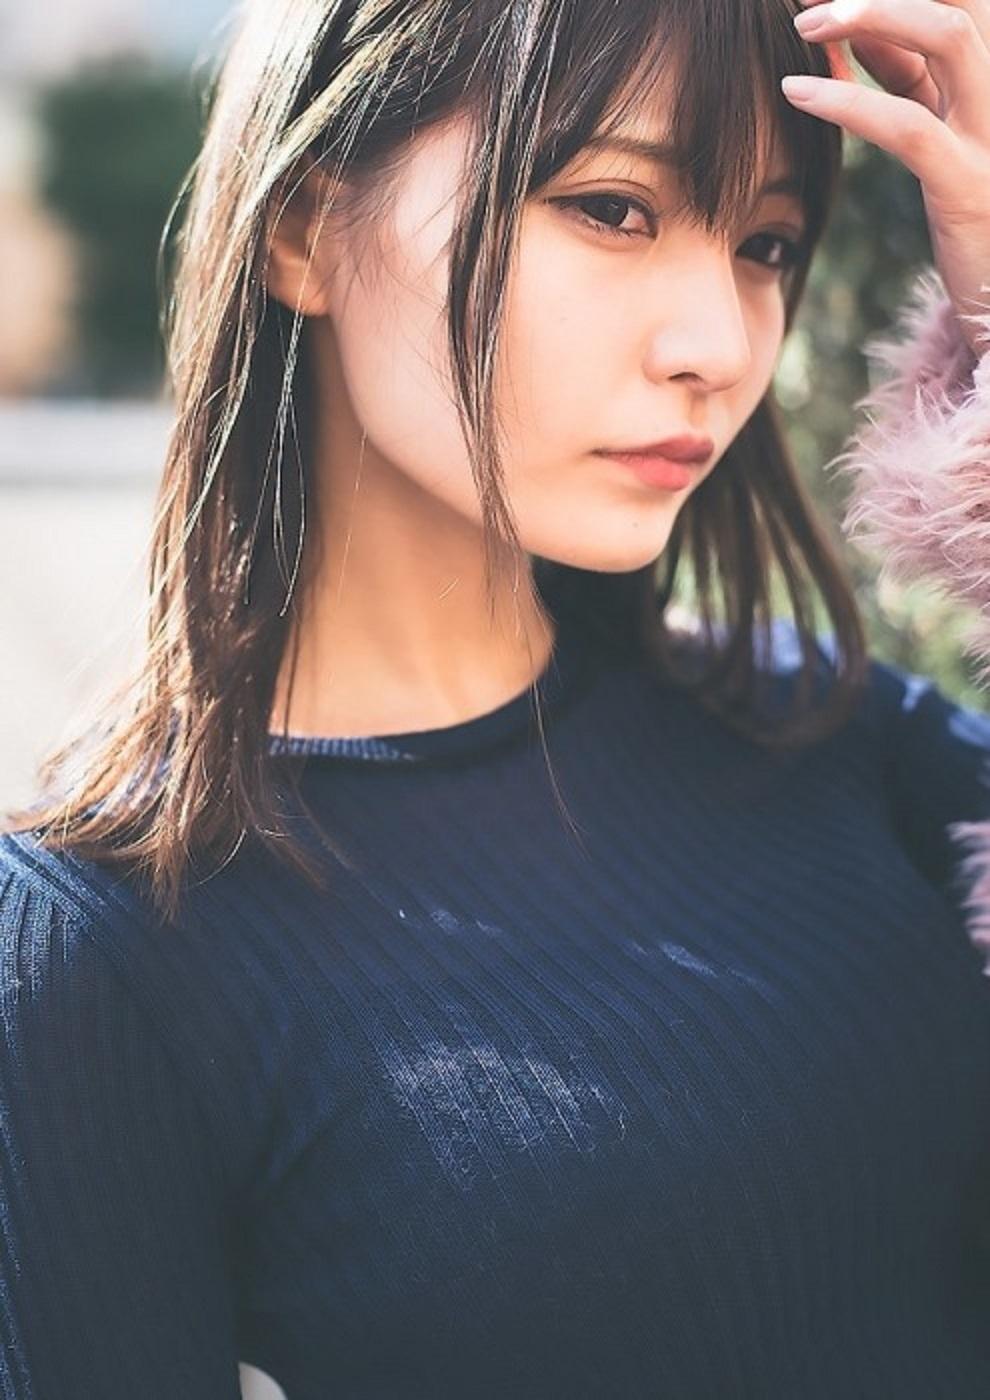 nitori_sayaka098.jpg